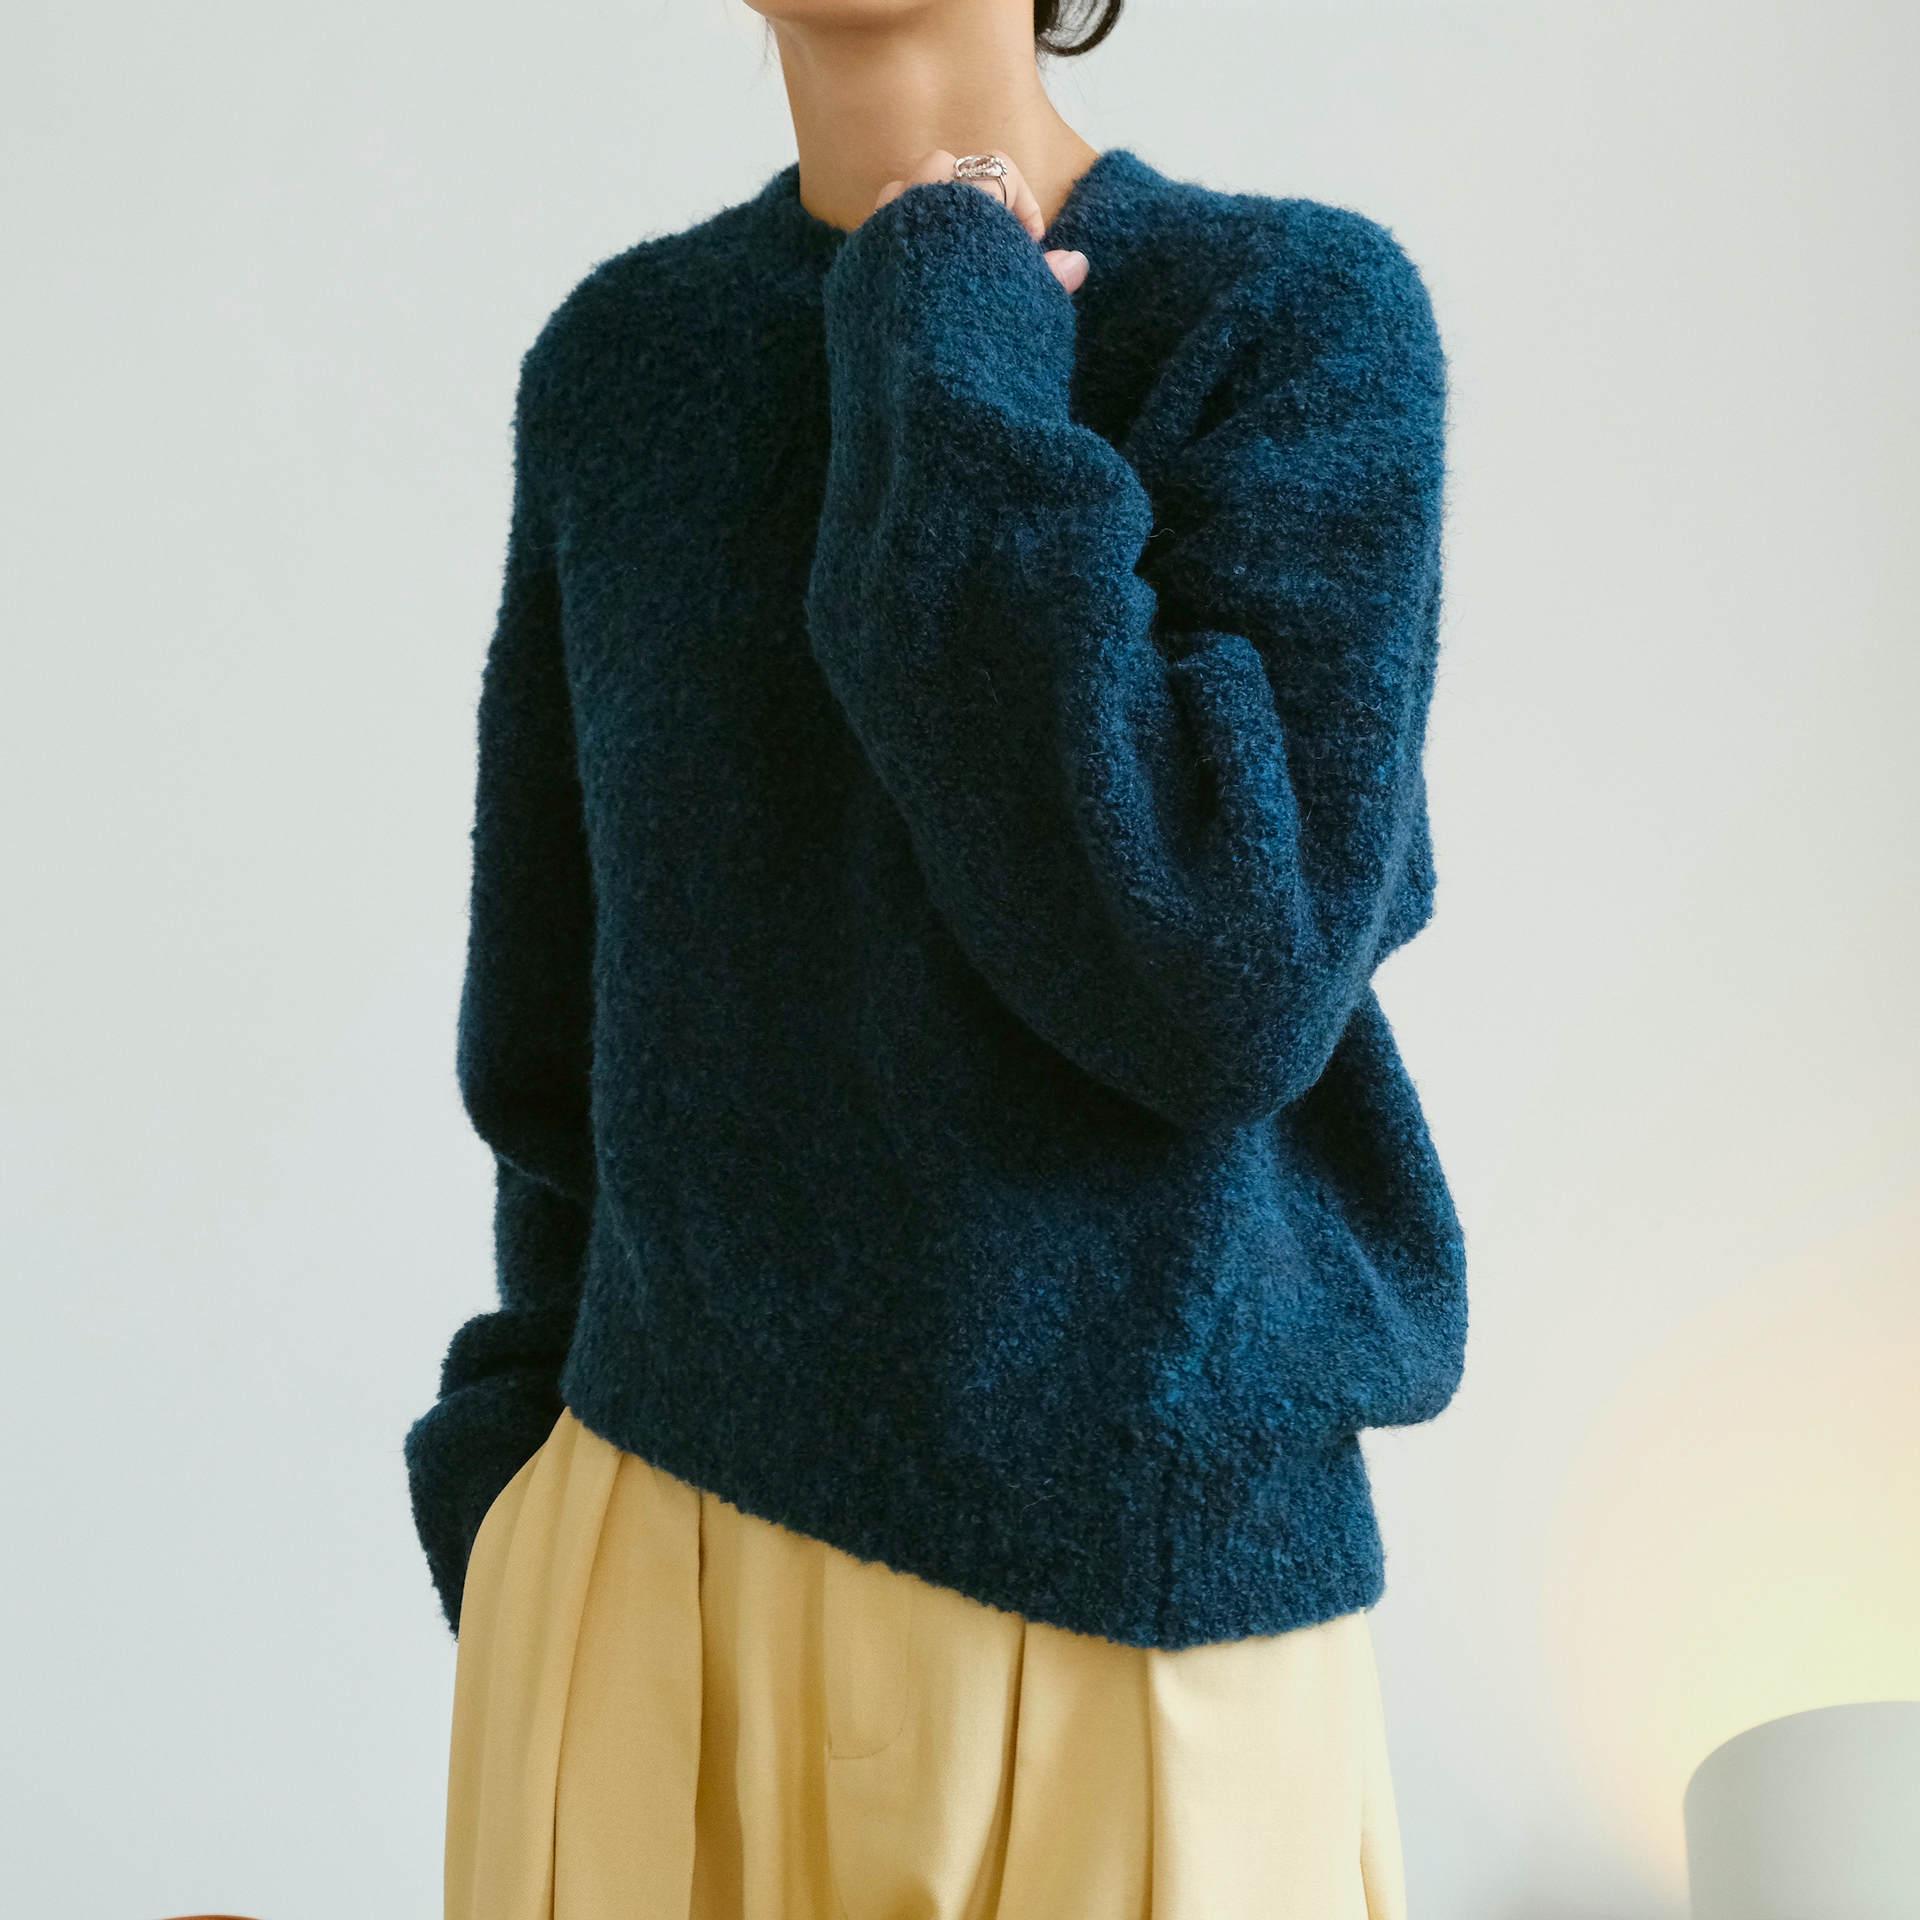 Korean Fashion Knit Pullovers Light Flower Gray/Retro Blue Wool Sweaters Soft Jumper Tops Femme Pull Chic Irregular Hem Design enlarge